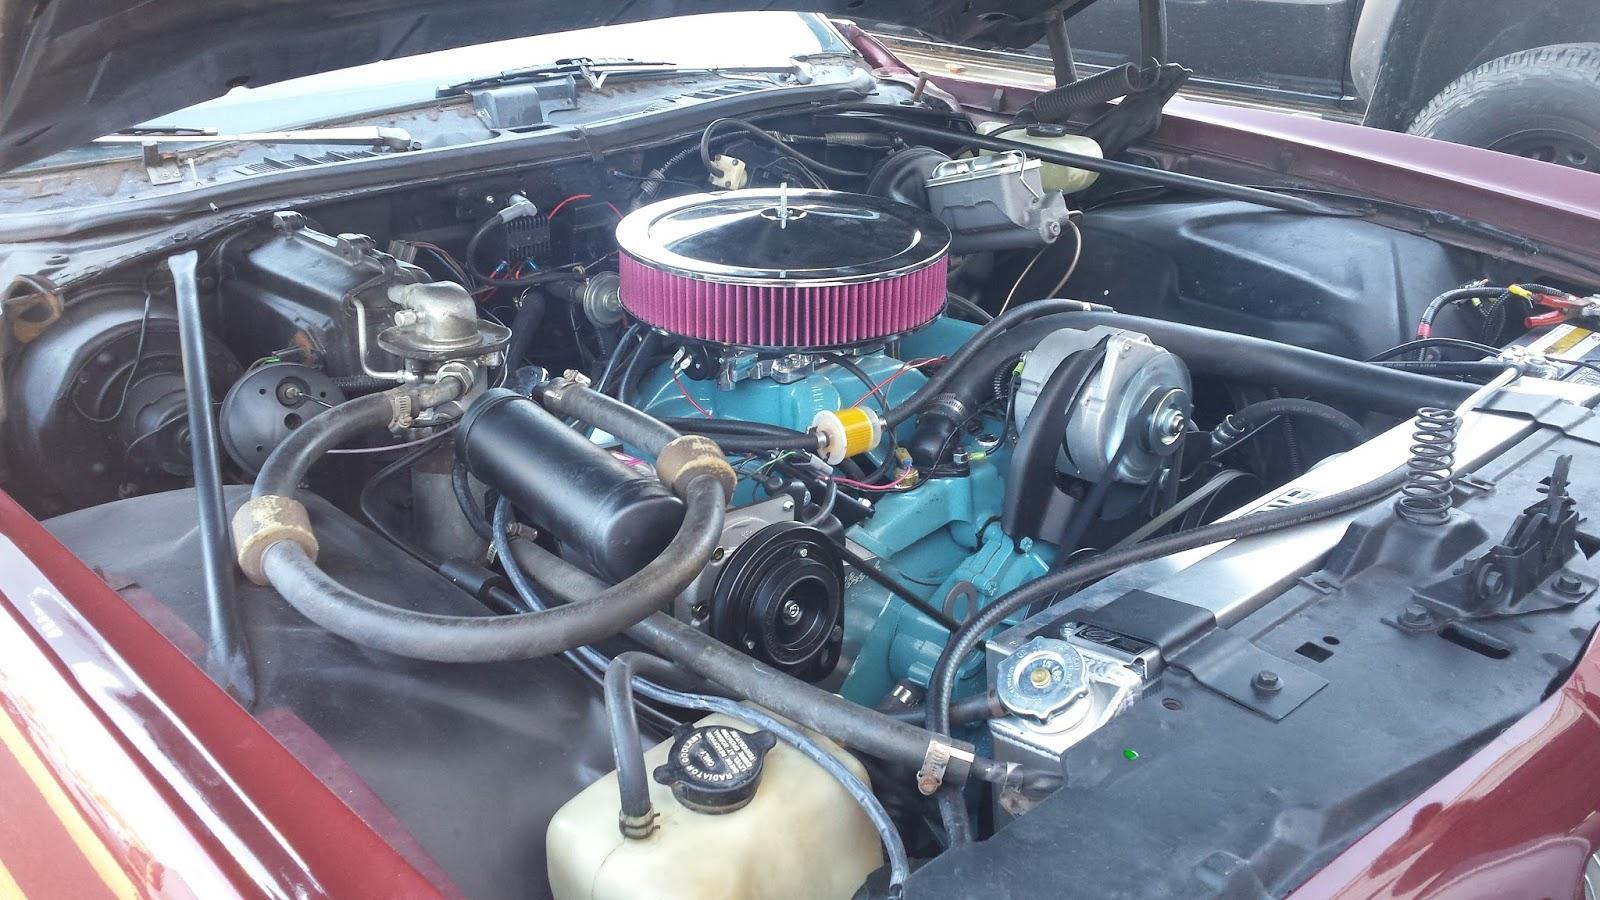 Driven Restorations: 1973 Pontiac 400 Built for HP and Fun!